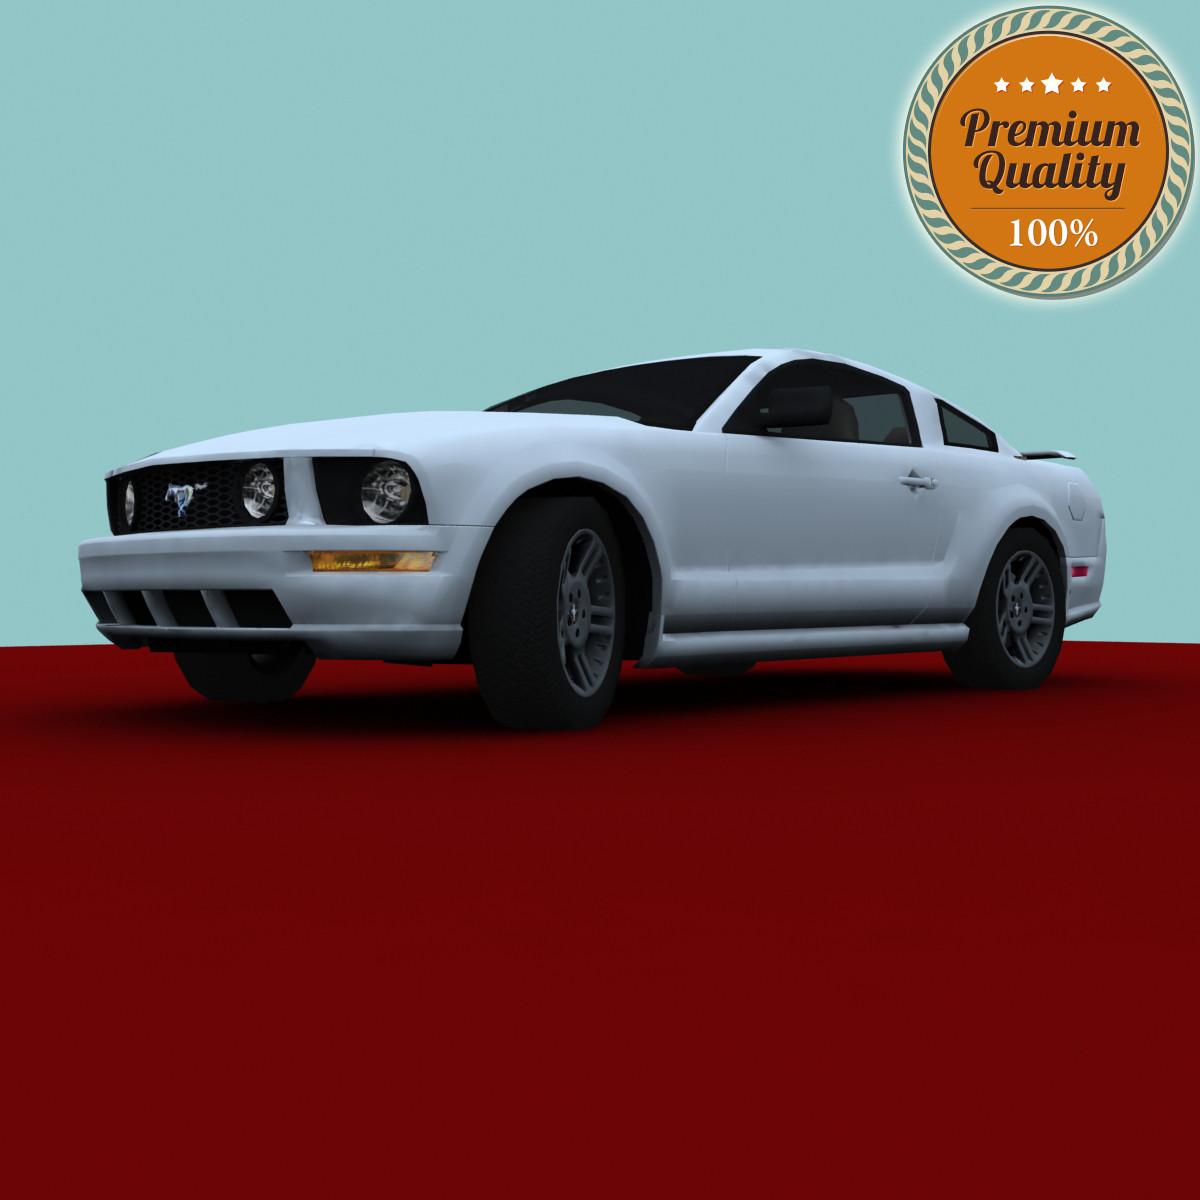 Mustang.jpg